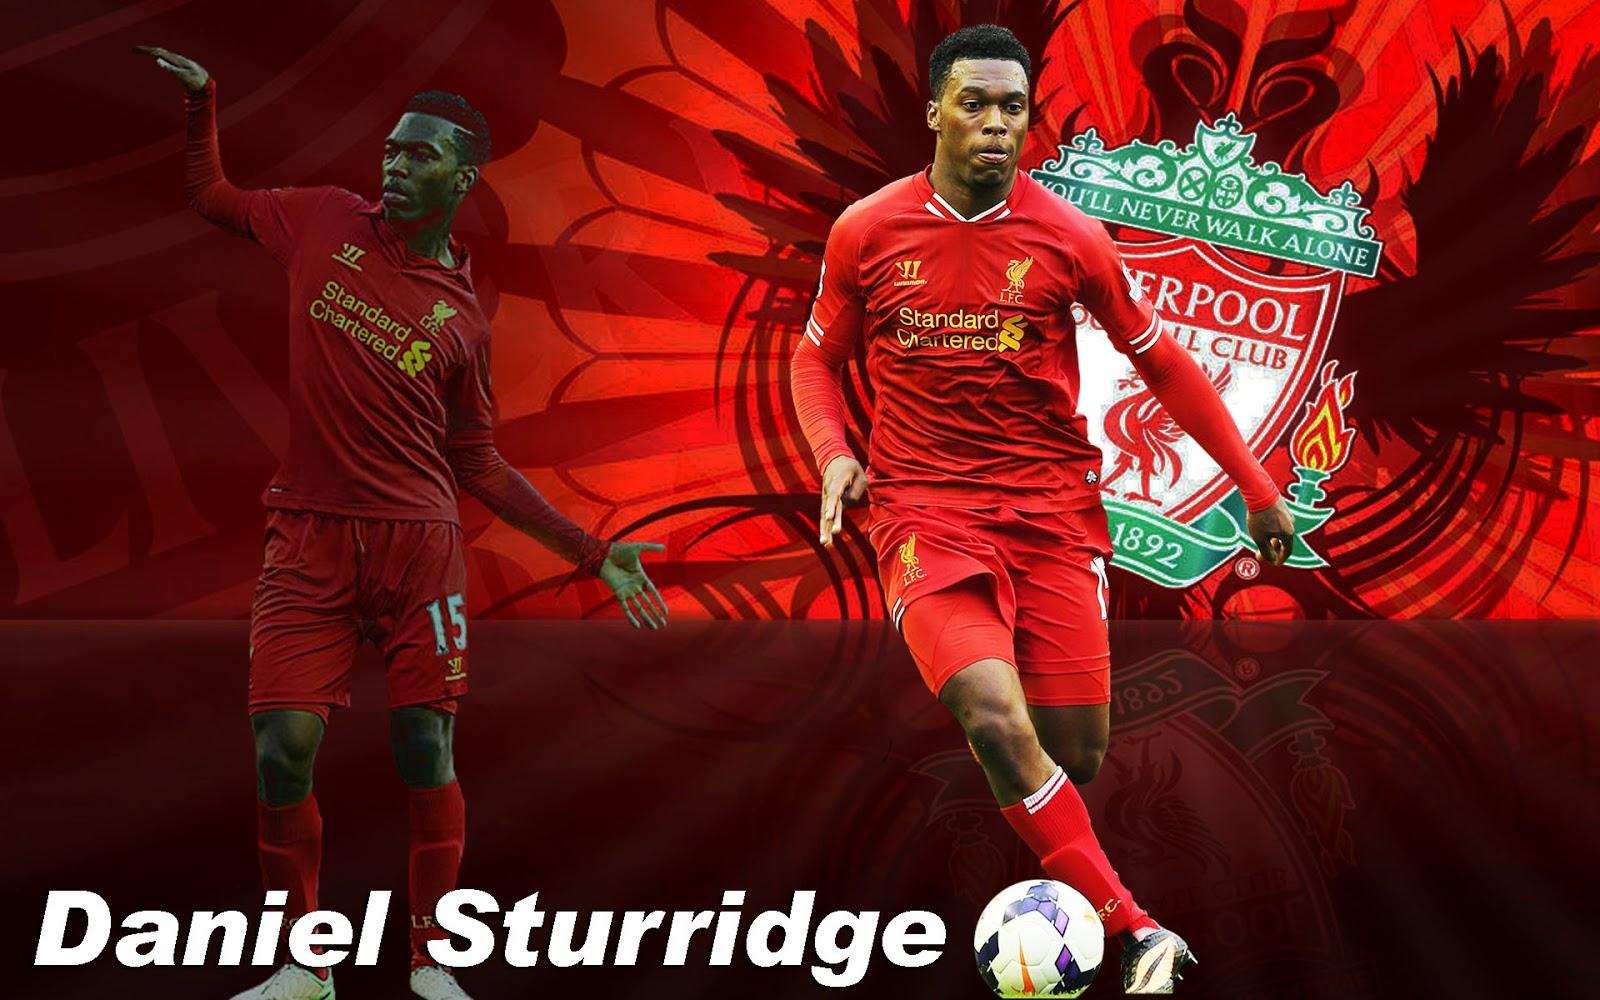 Daniel Sturridge Liverpool Wallpaper Player Football Wallpaper